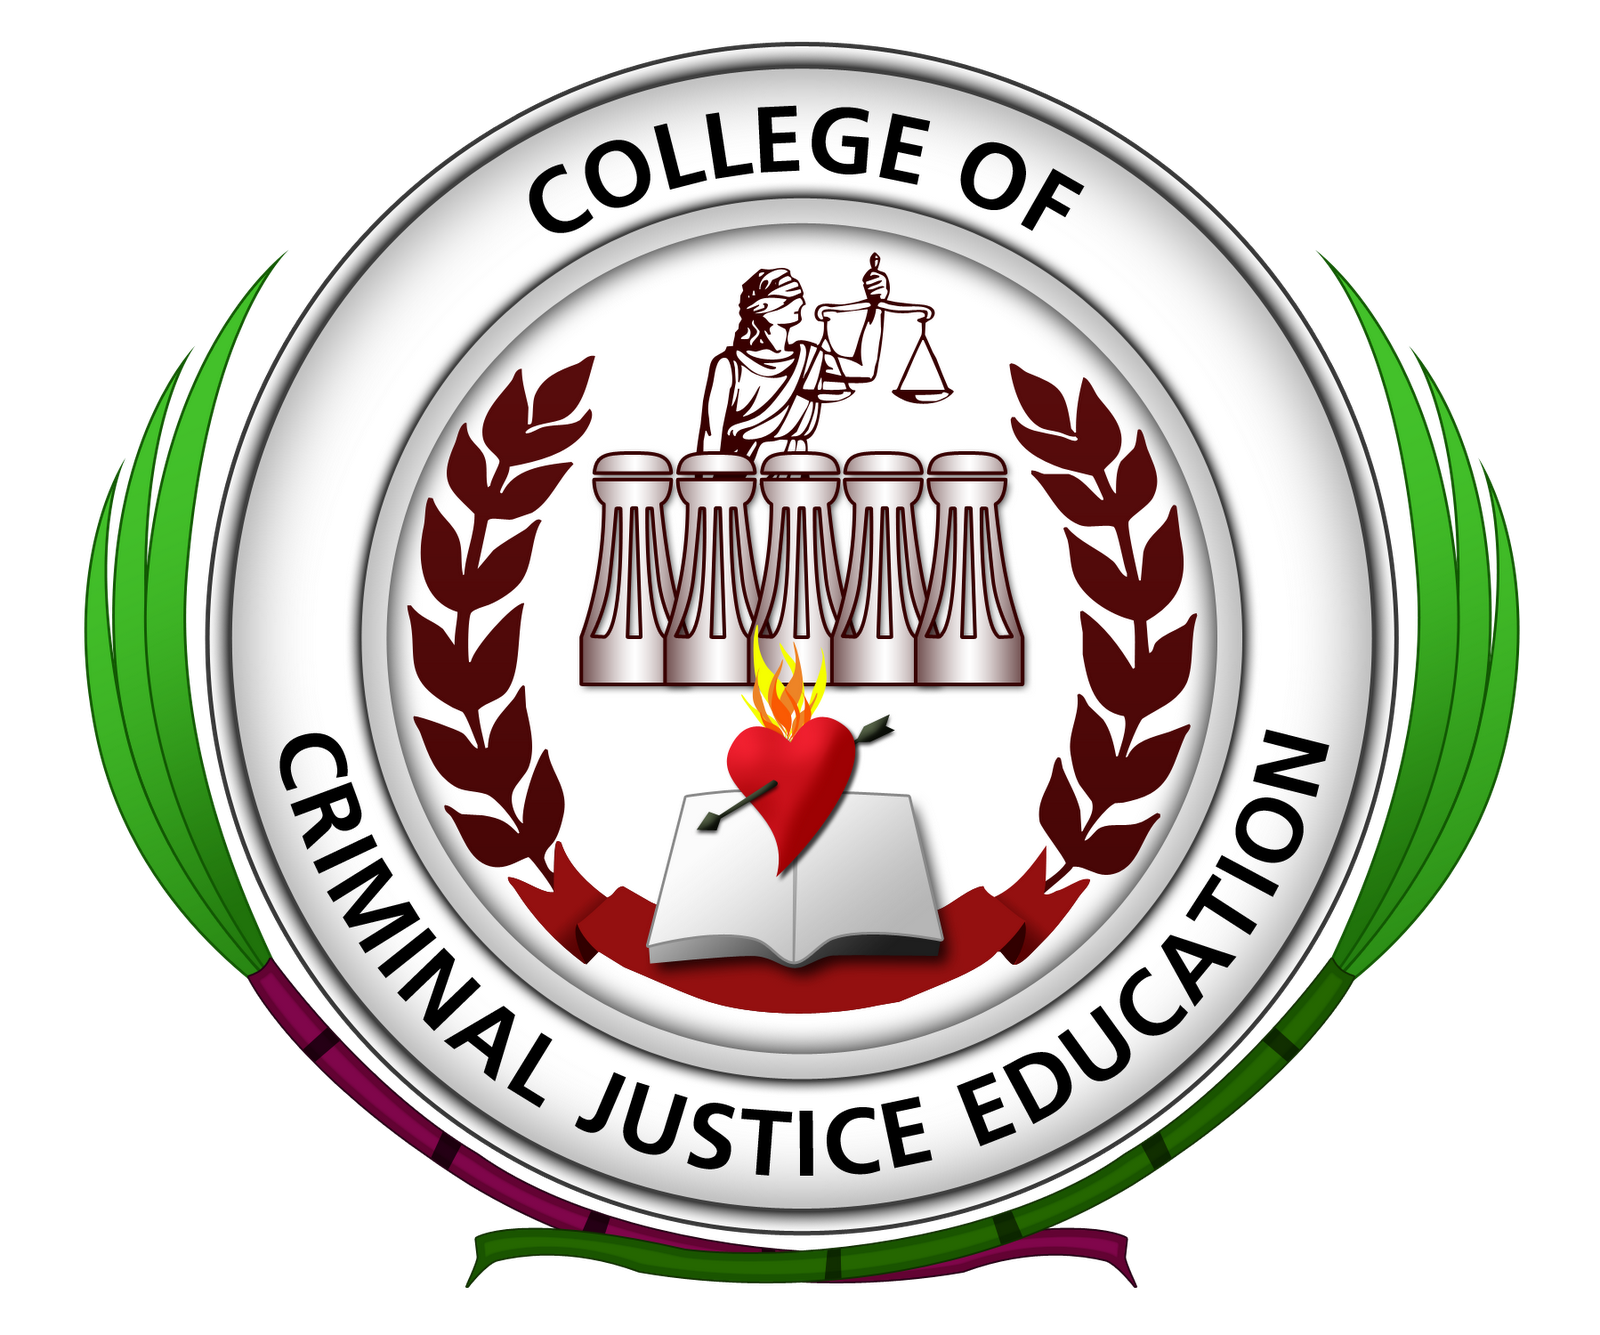 Tolentine herald criminal justice education criminal justice education biocorpaavc Choice Image